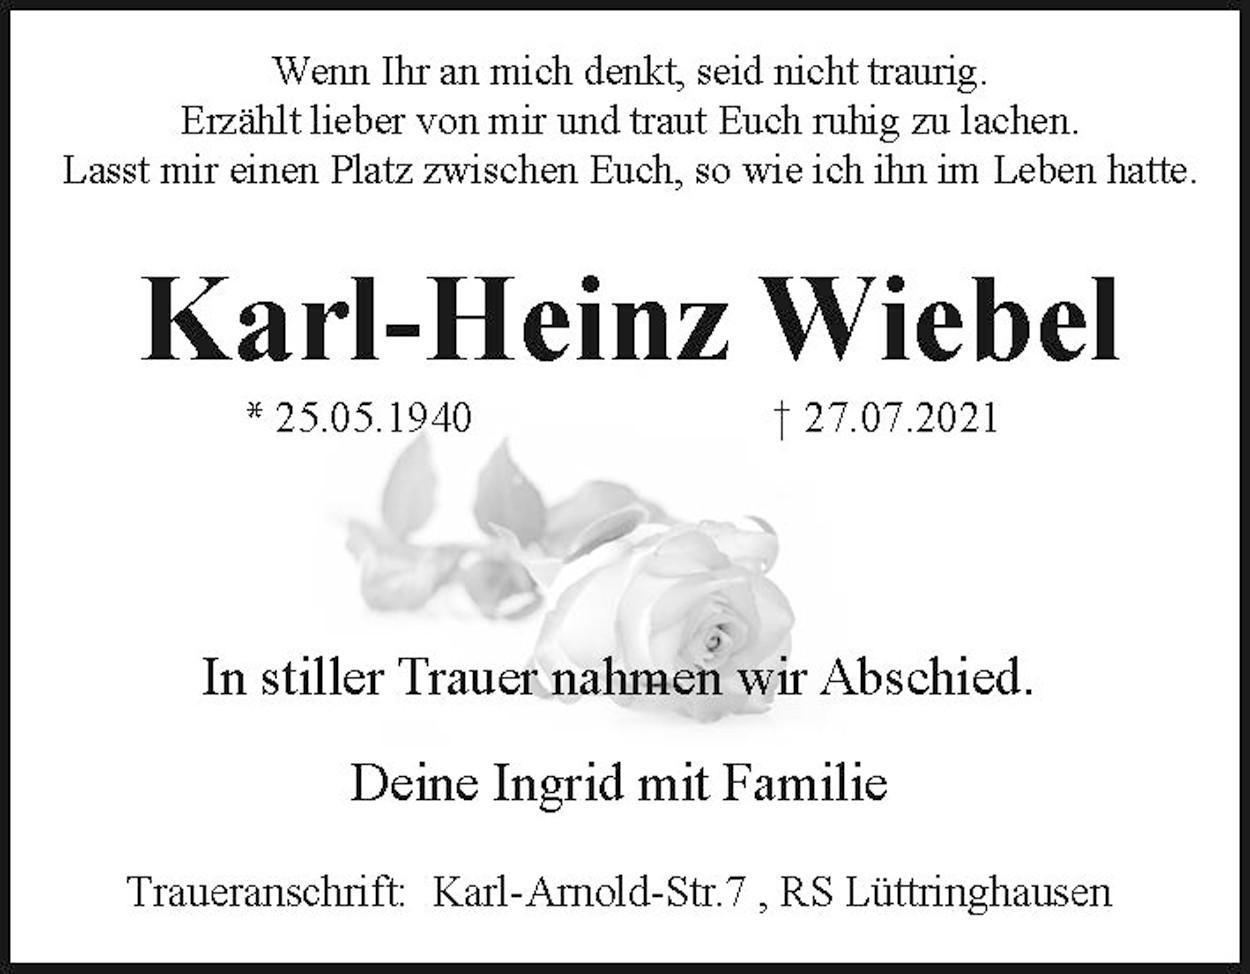 Karl-Heinz Wiebel